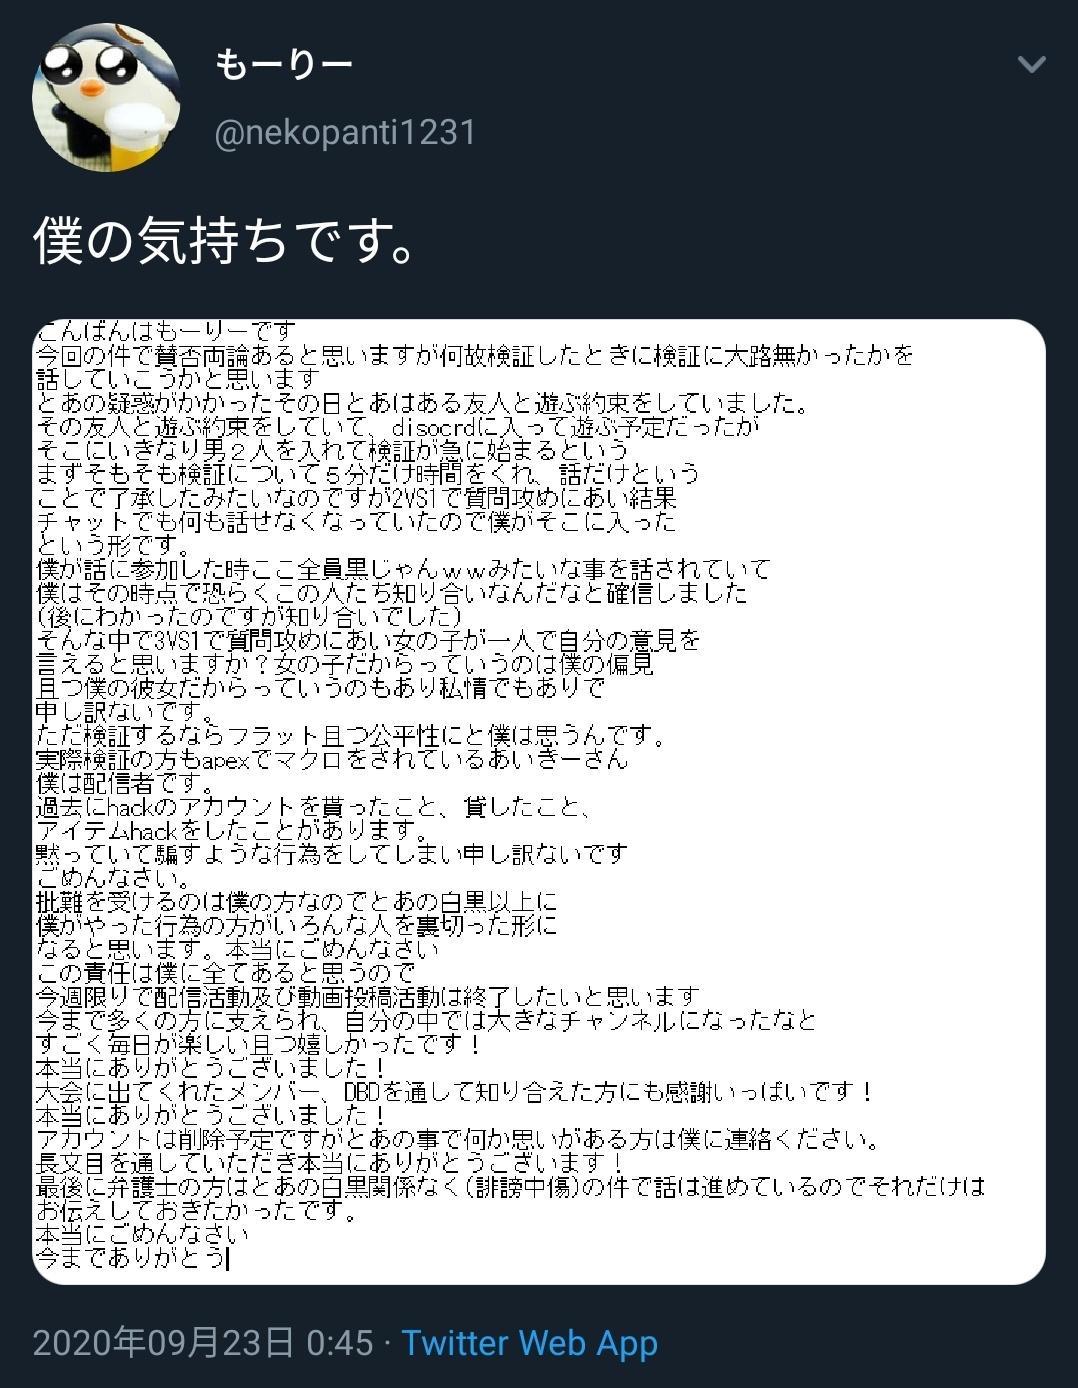 fPJHIyo.jpg